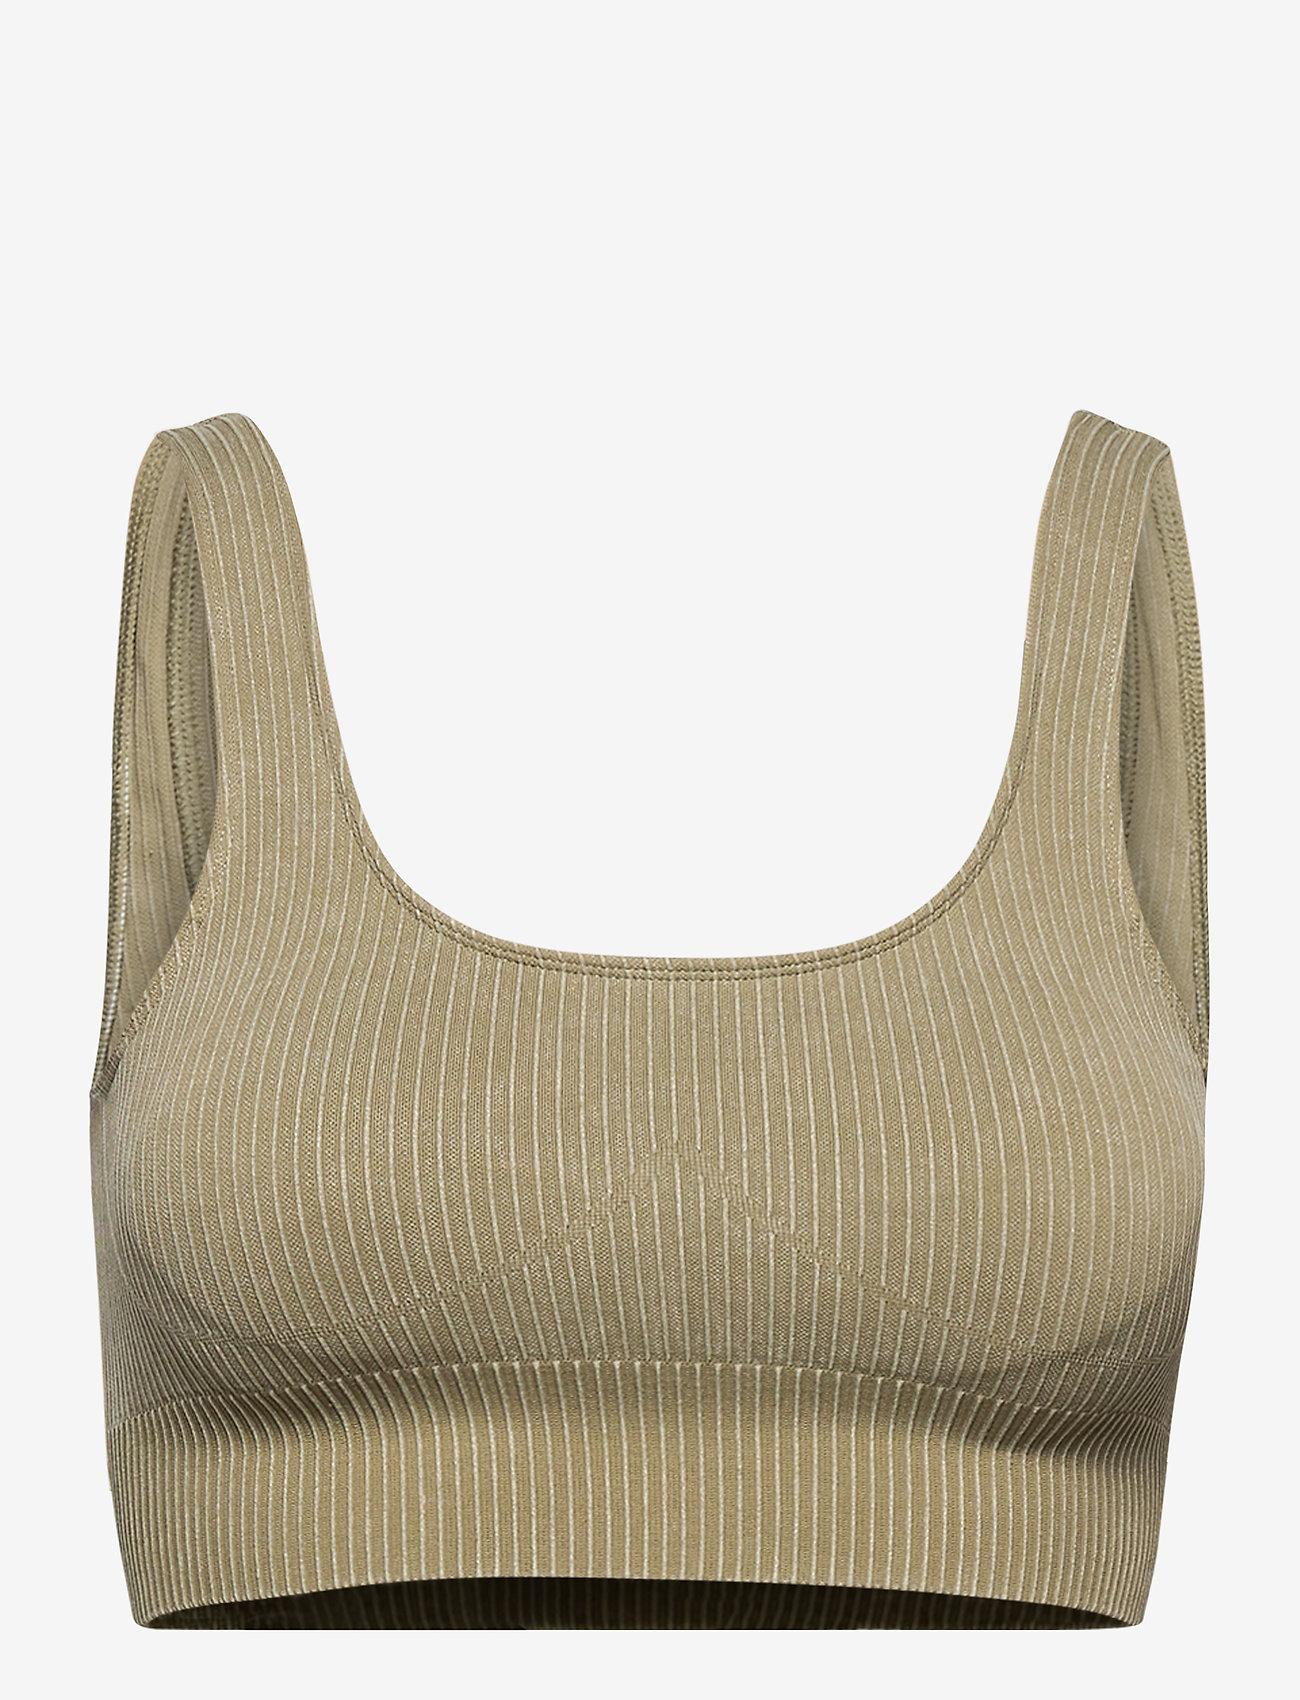 AIM'N - Wild Olive Ribbed Seamless Bra - sort bras:high - wild olive - 1